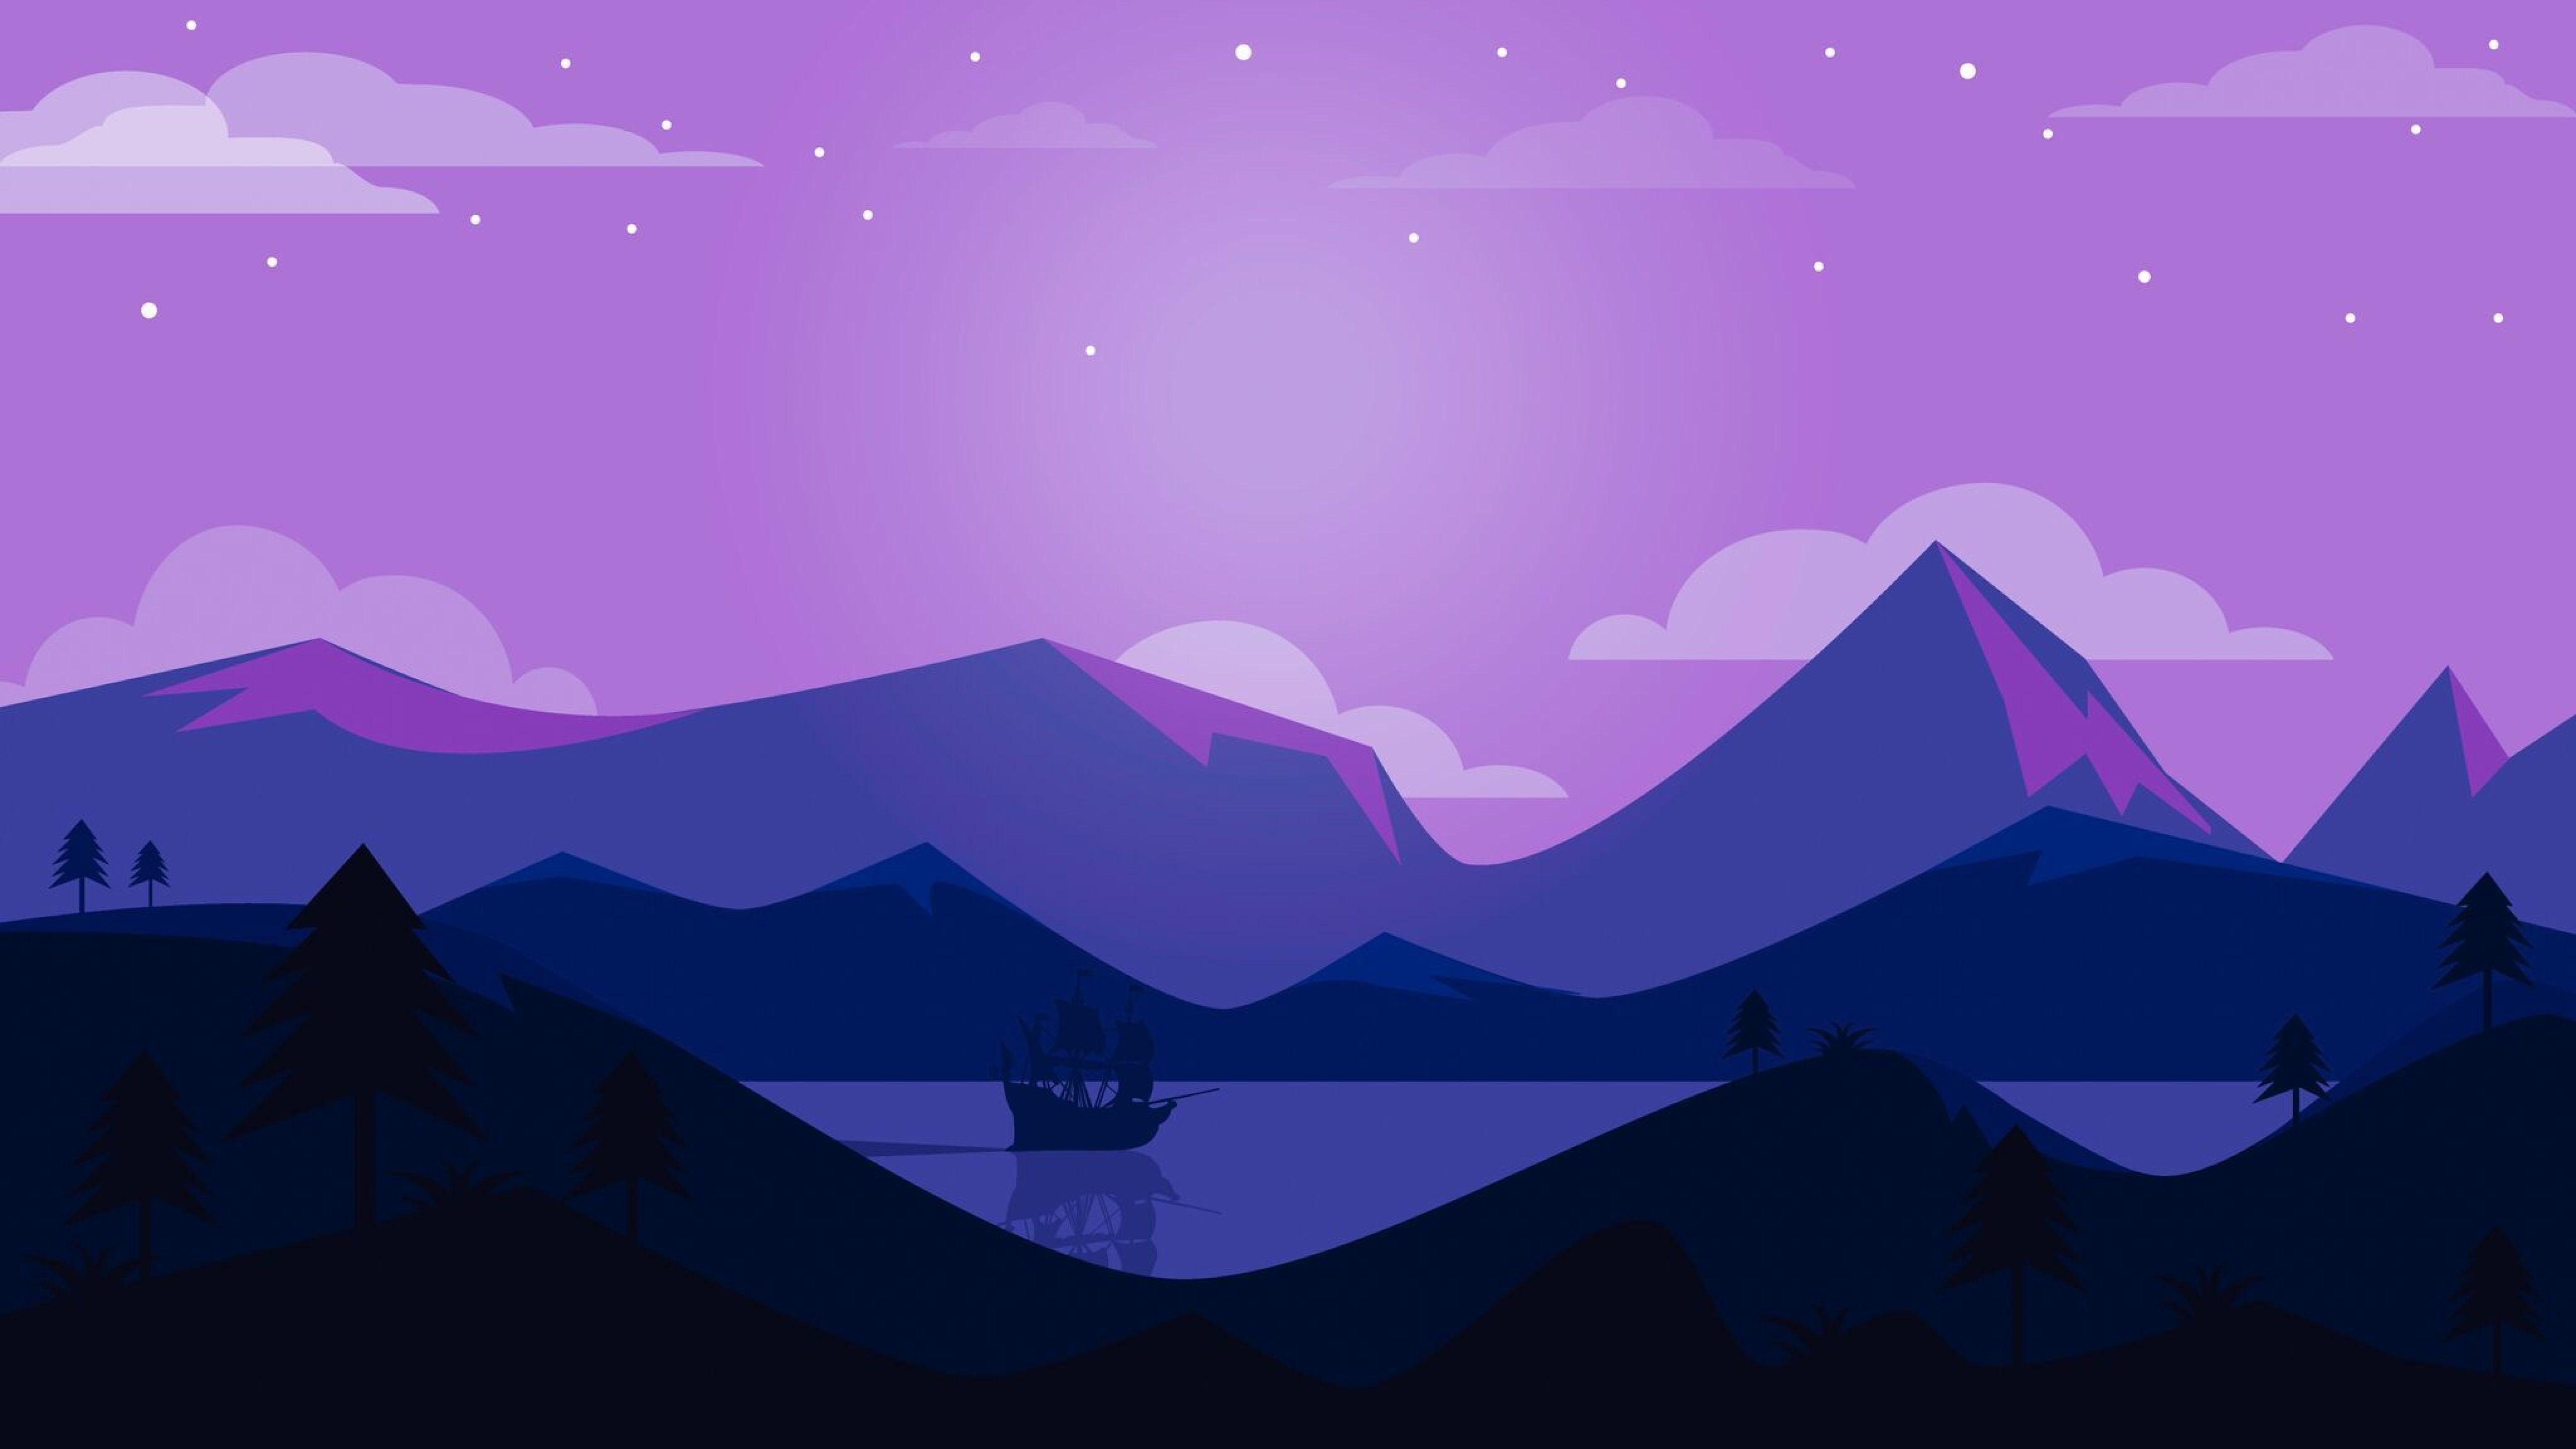 5120x2880 Minimal Ship Artwork Purple Background 5K Wallpaper HD 5120x2880